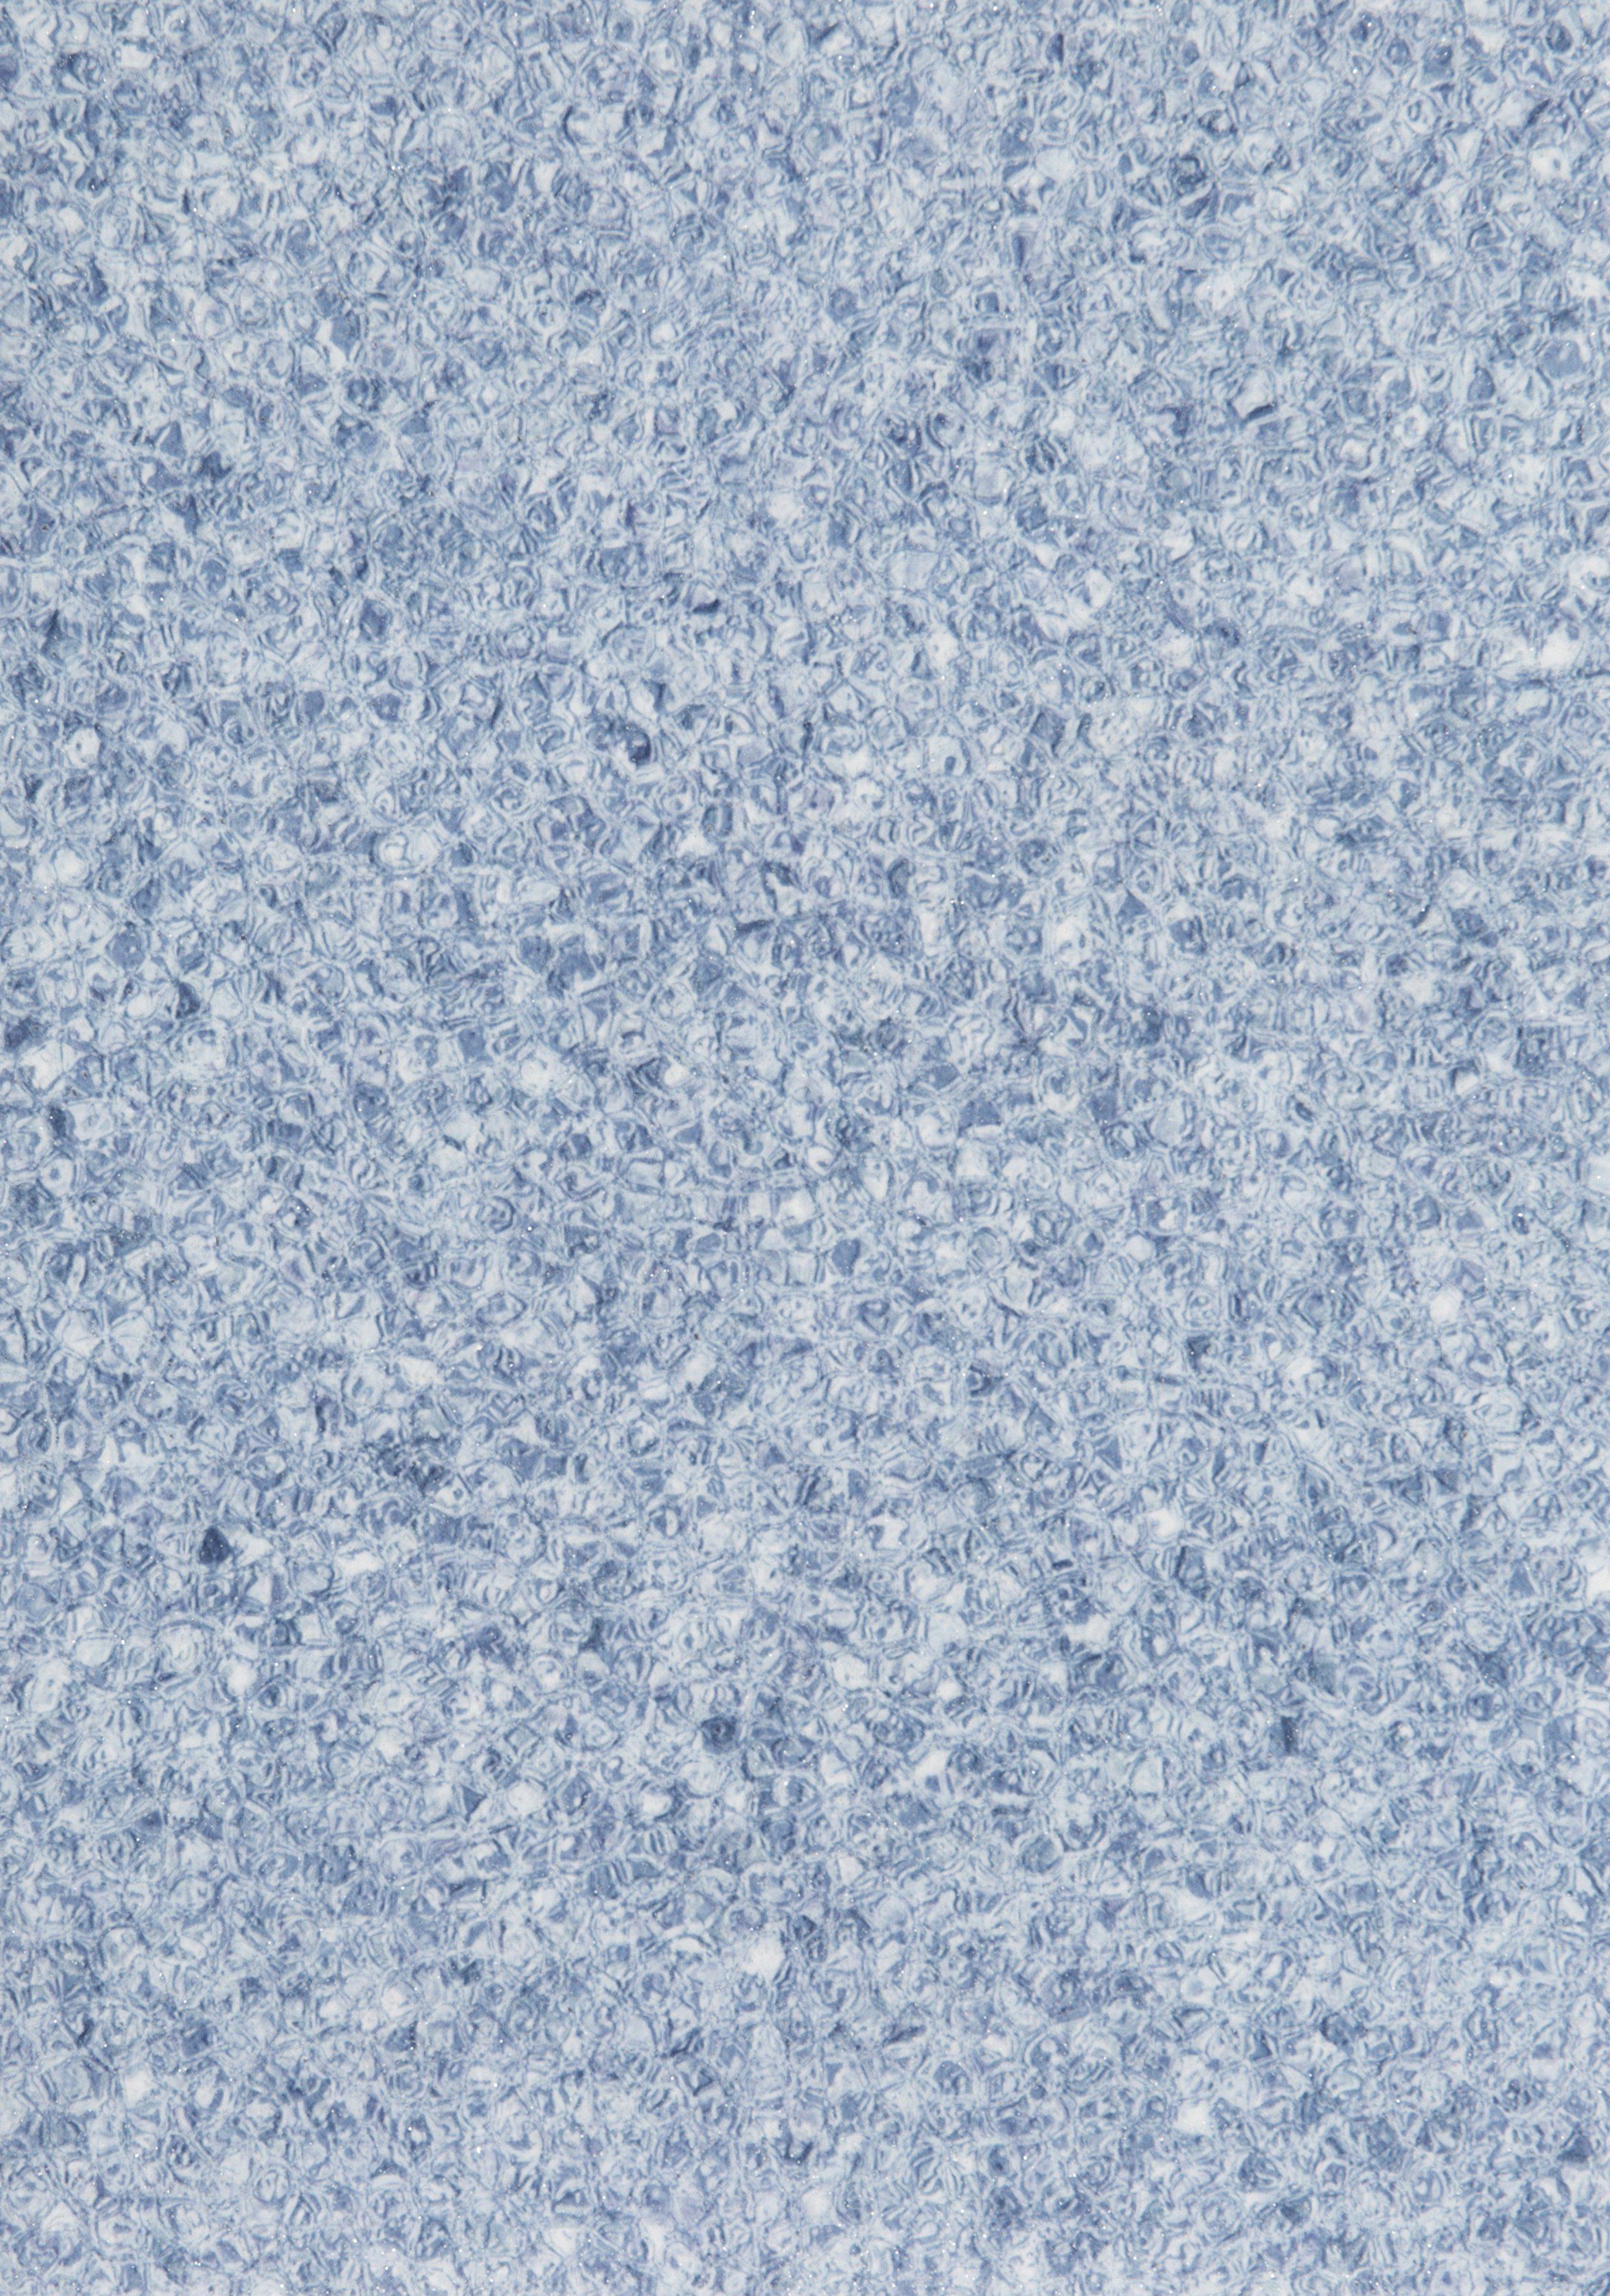 ANDIAMO Vinyl-Boden »Glare«, Breite 200 cm, blau